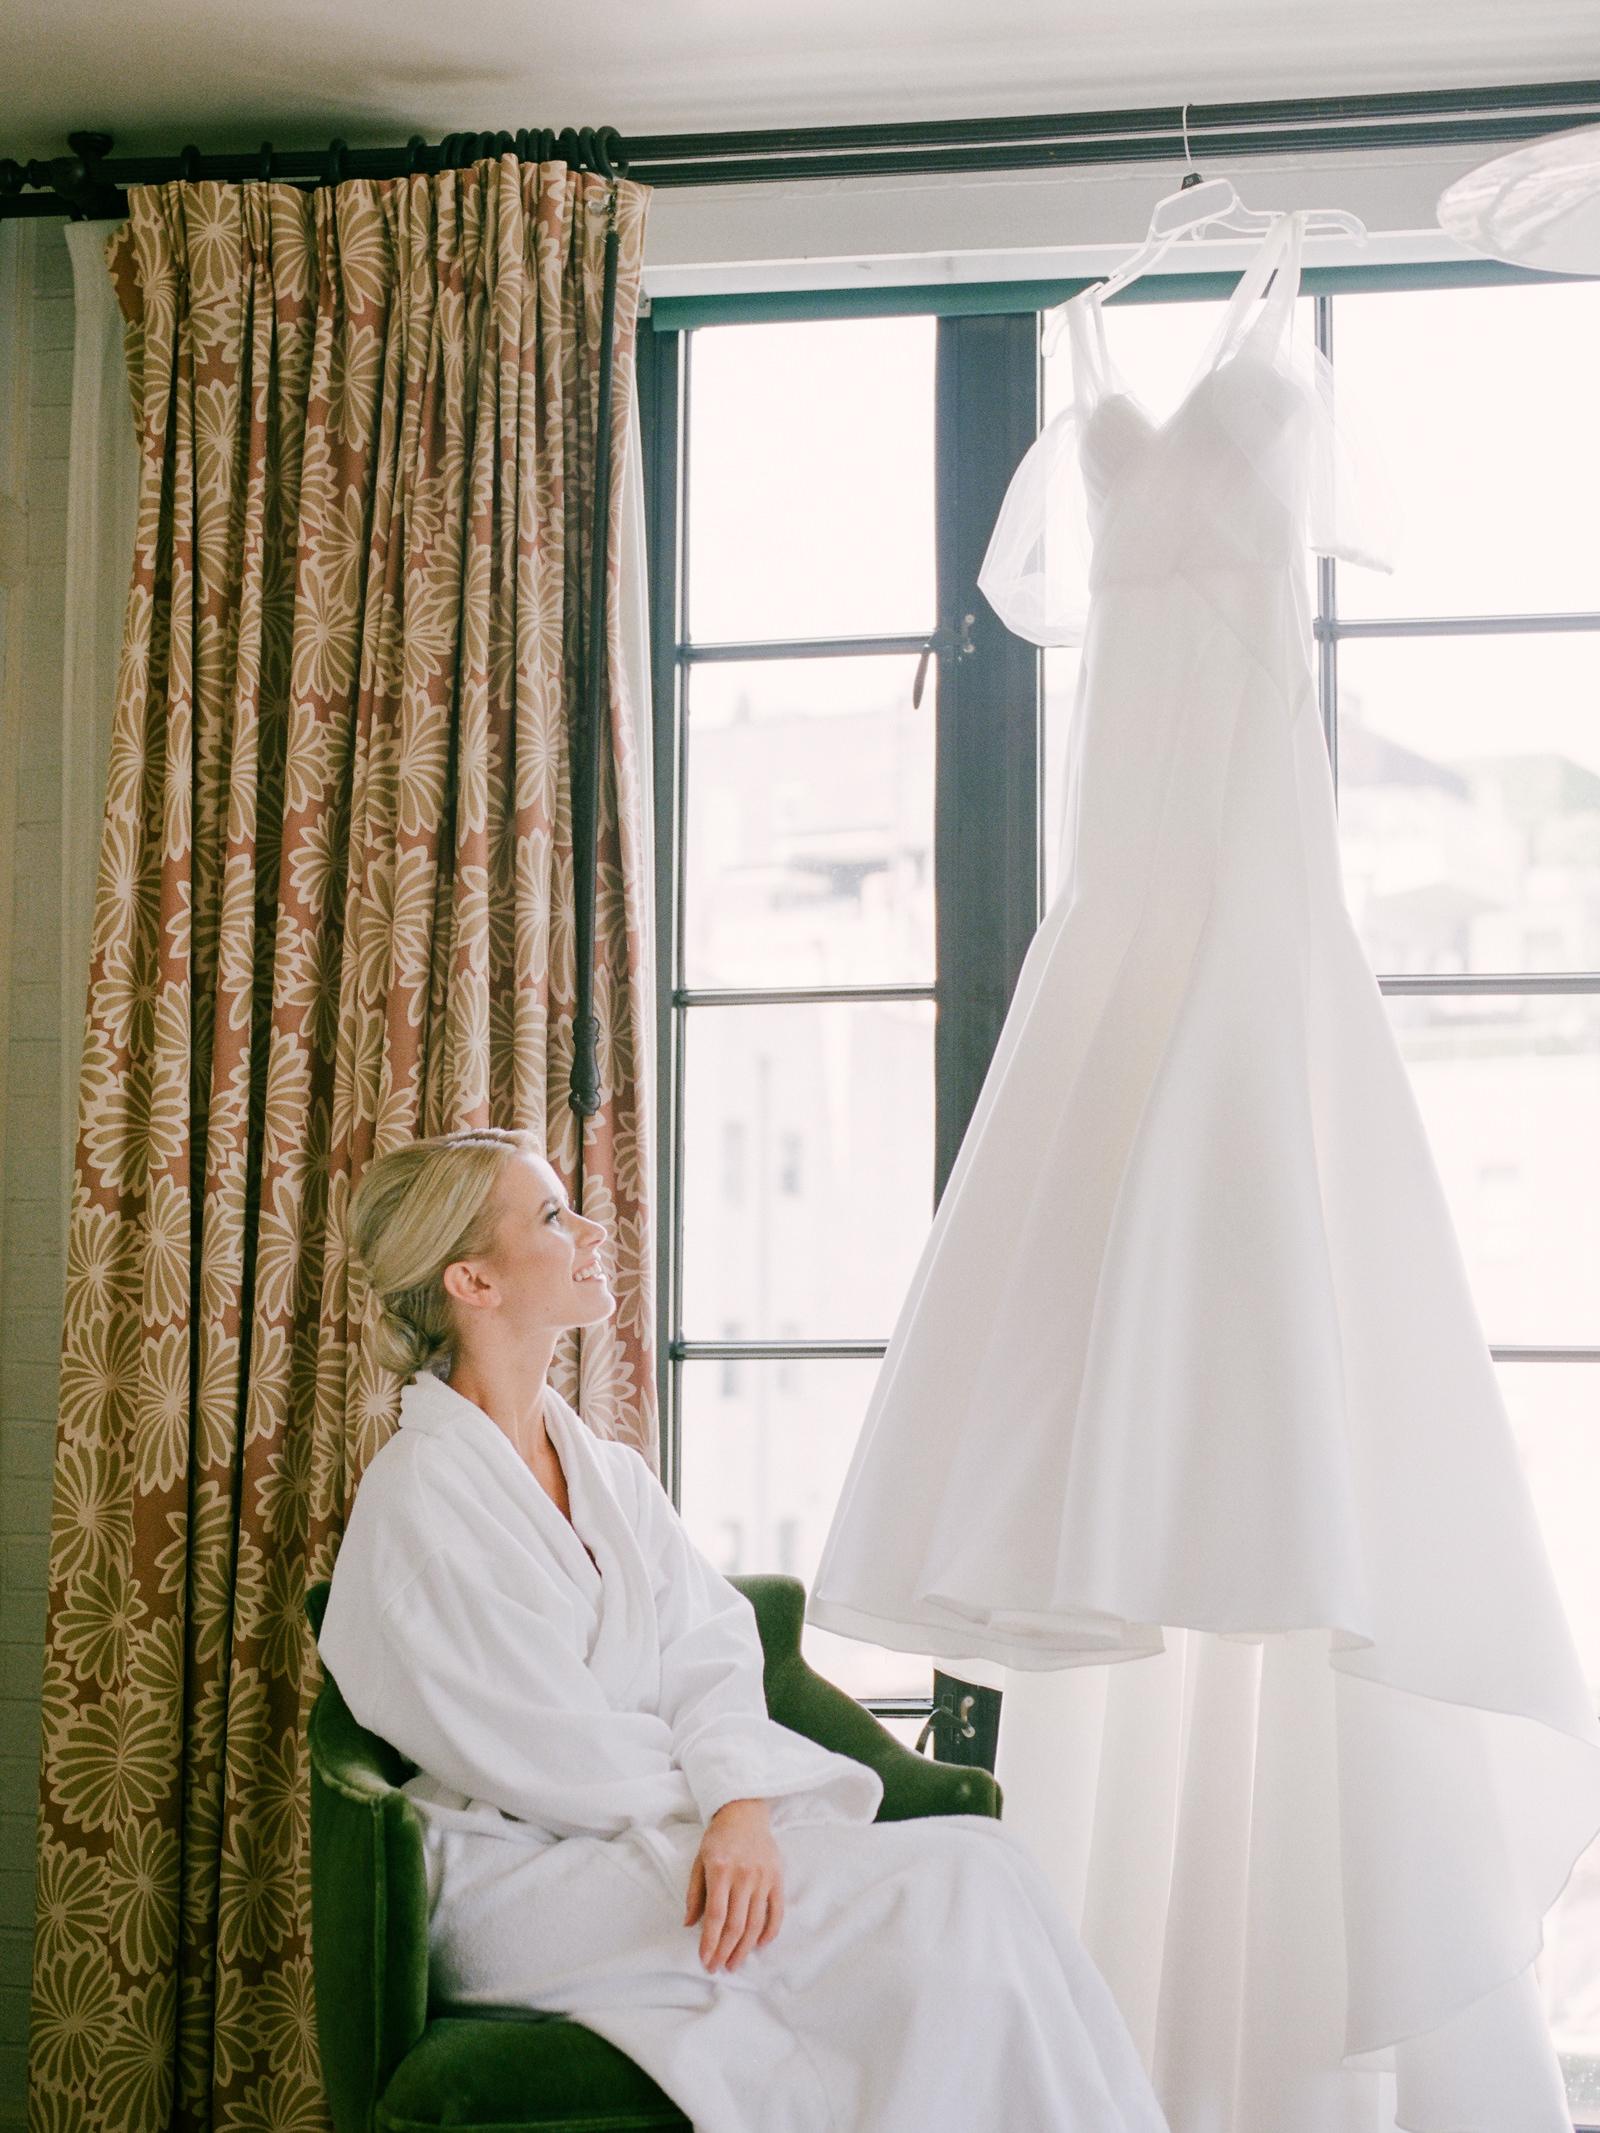 Intimate-NYC_wedding_ by Tanya Isaeva-52.jpg